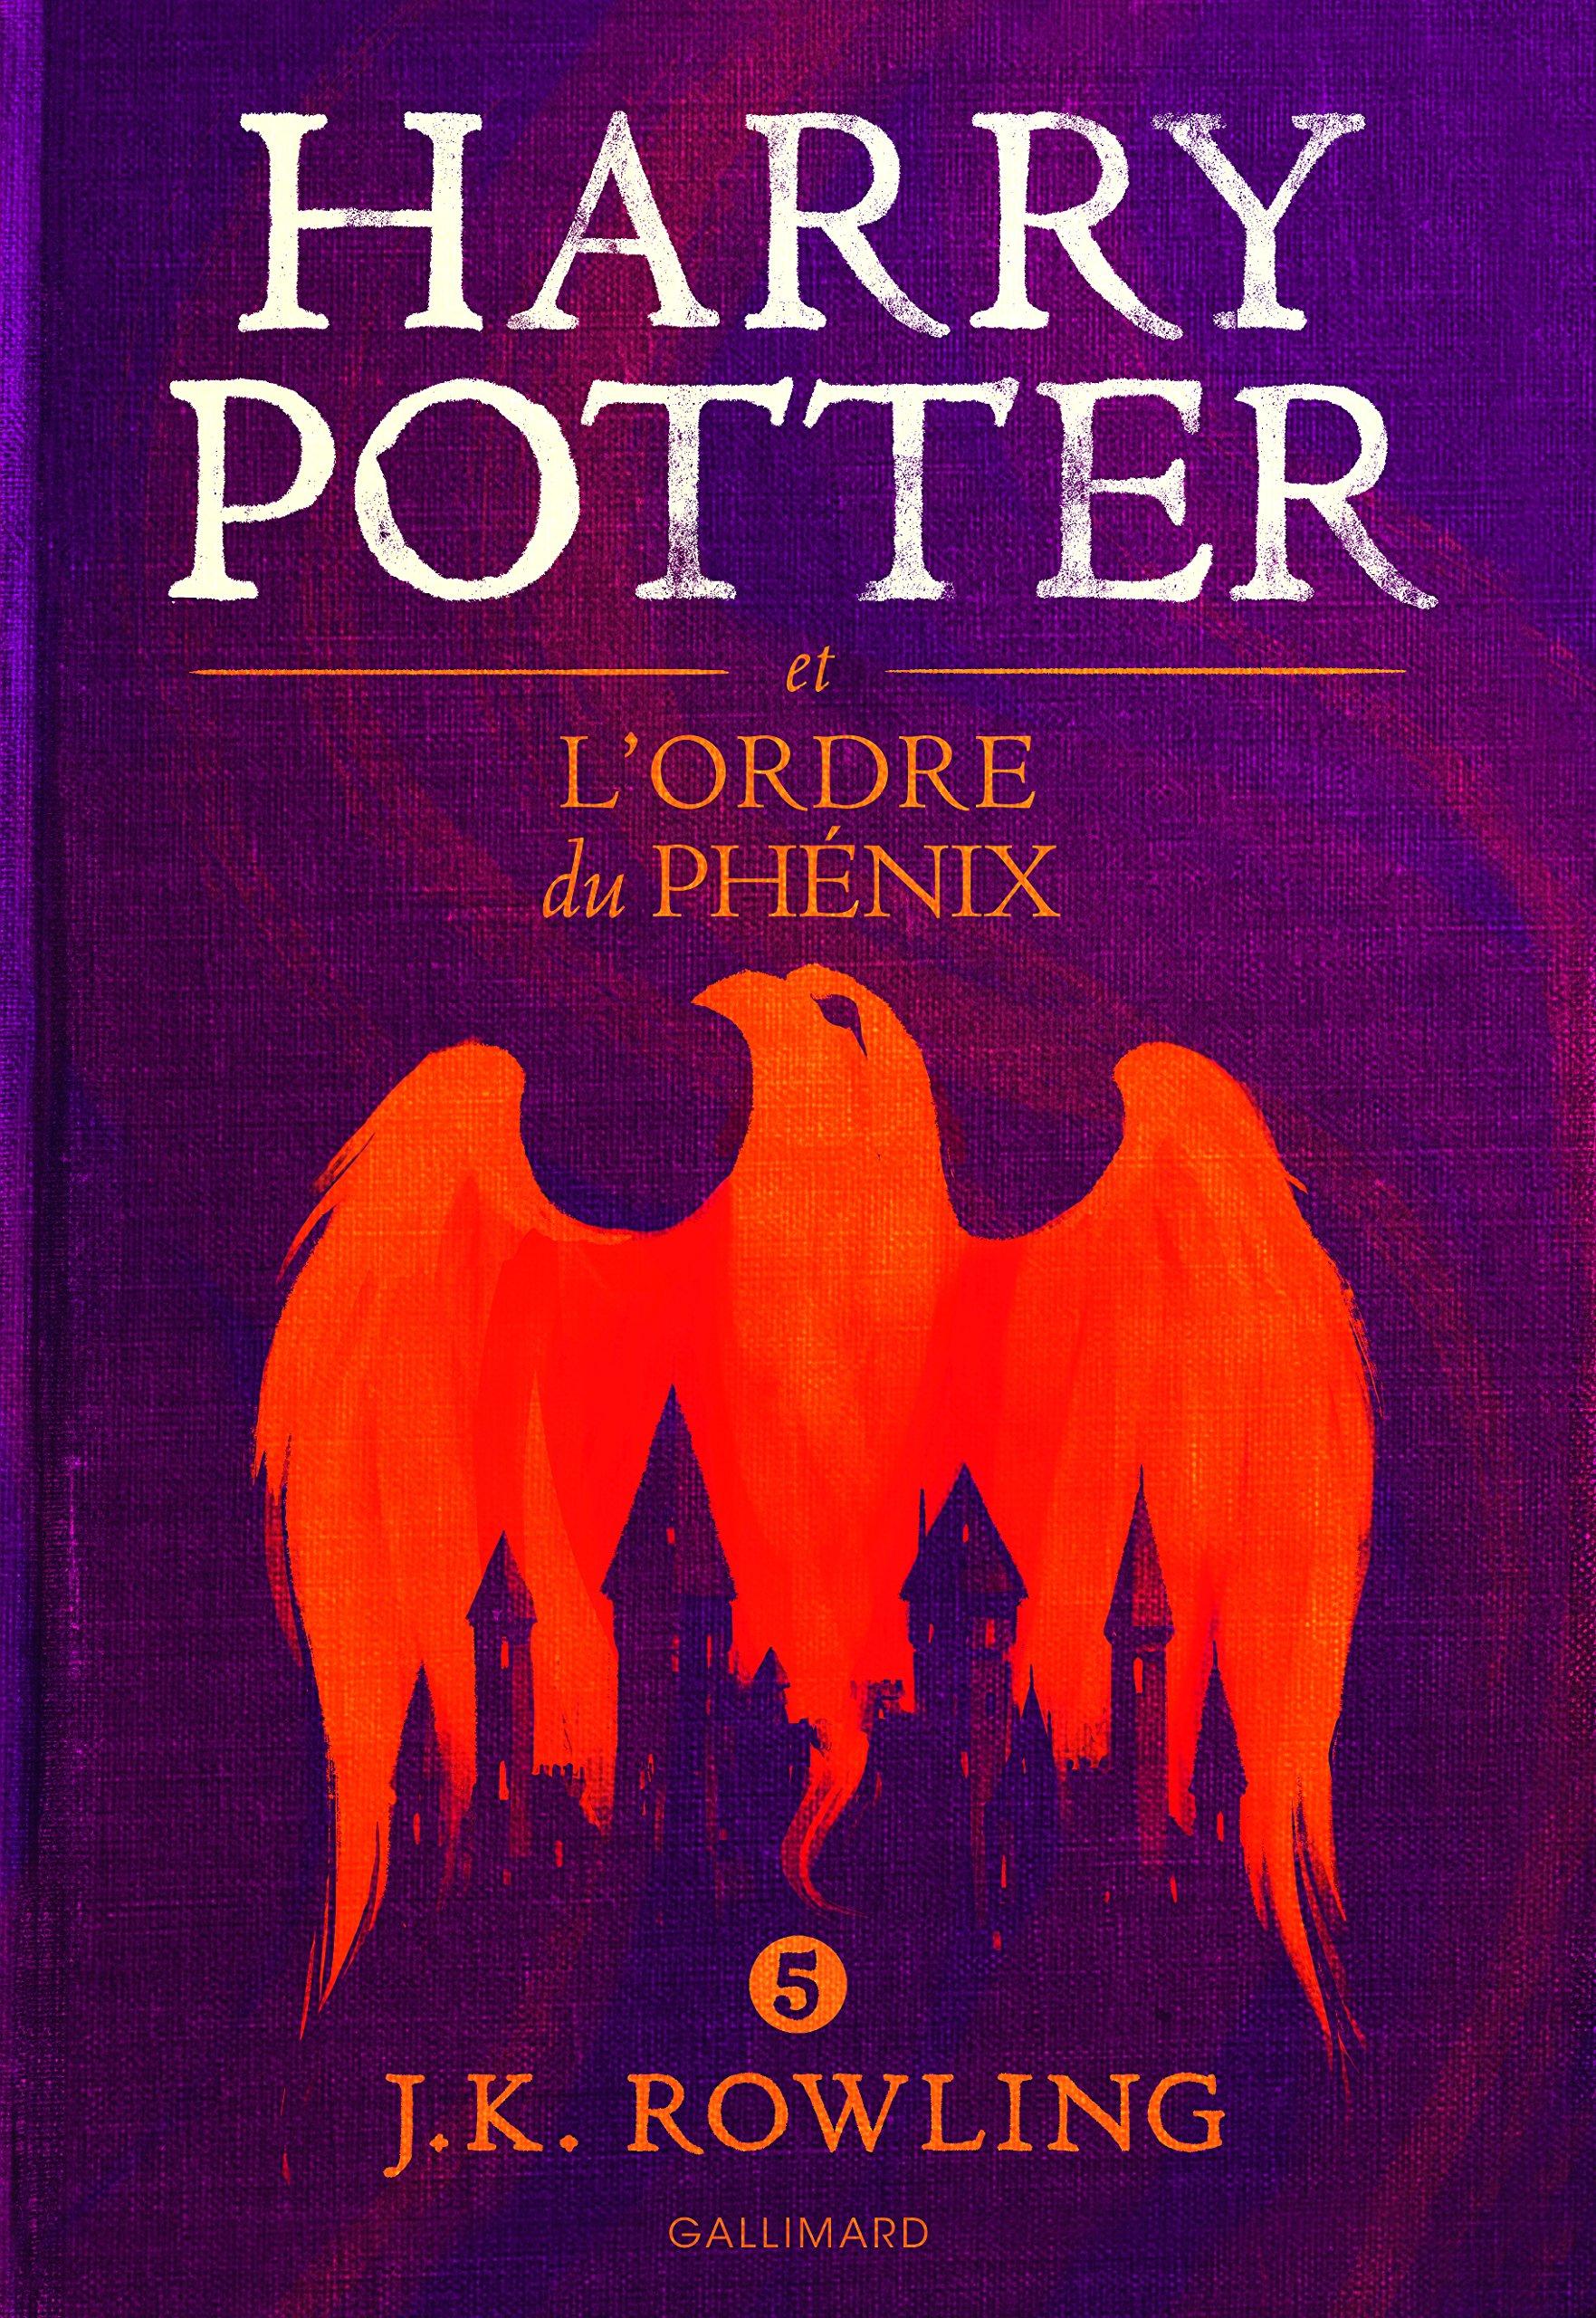 Read Online Harry Potter, V : Harry Potter et l'Ordre du Phénix - grand format [ Harry Potter and the Order of the Phoenix ] large format (French Edition) pdf epub